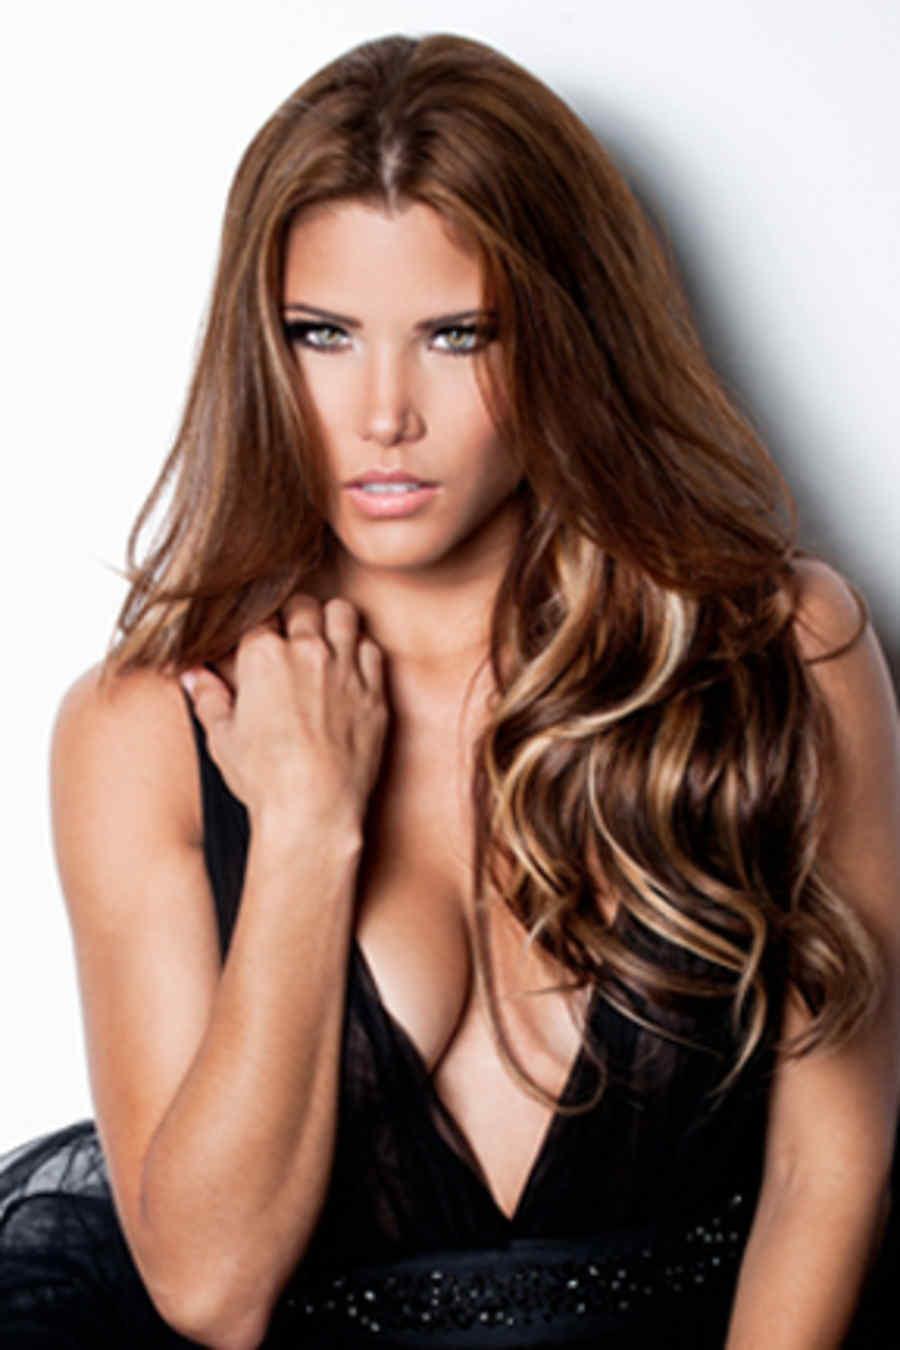 Gabriela Berrios is Miss Puerto Rico in Miss Universe